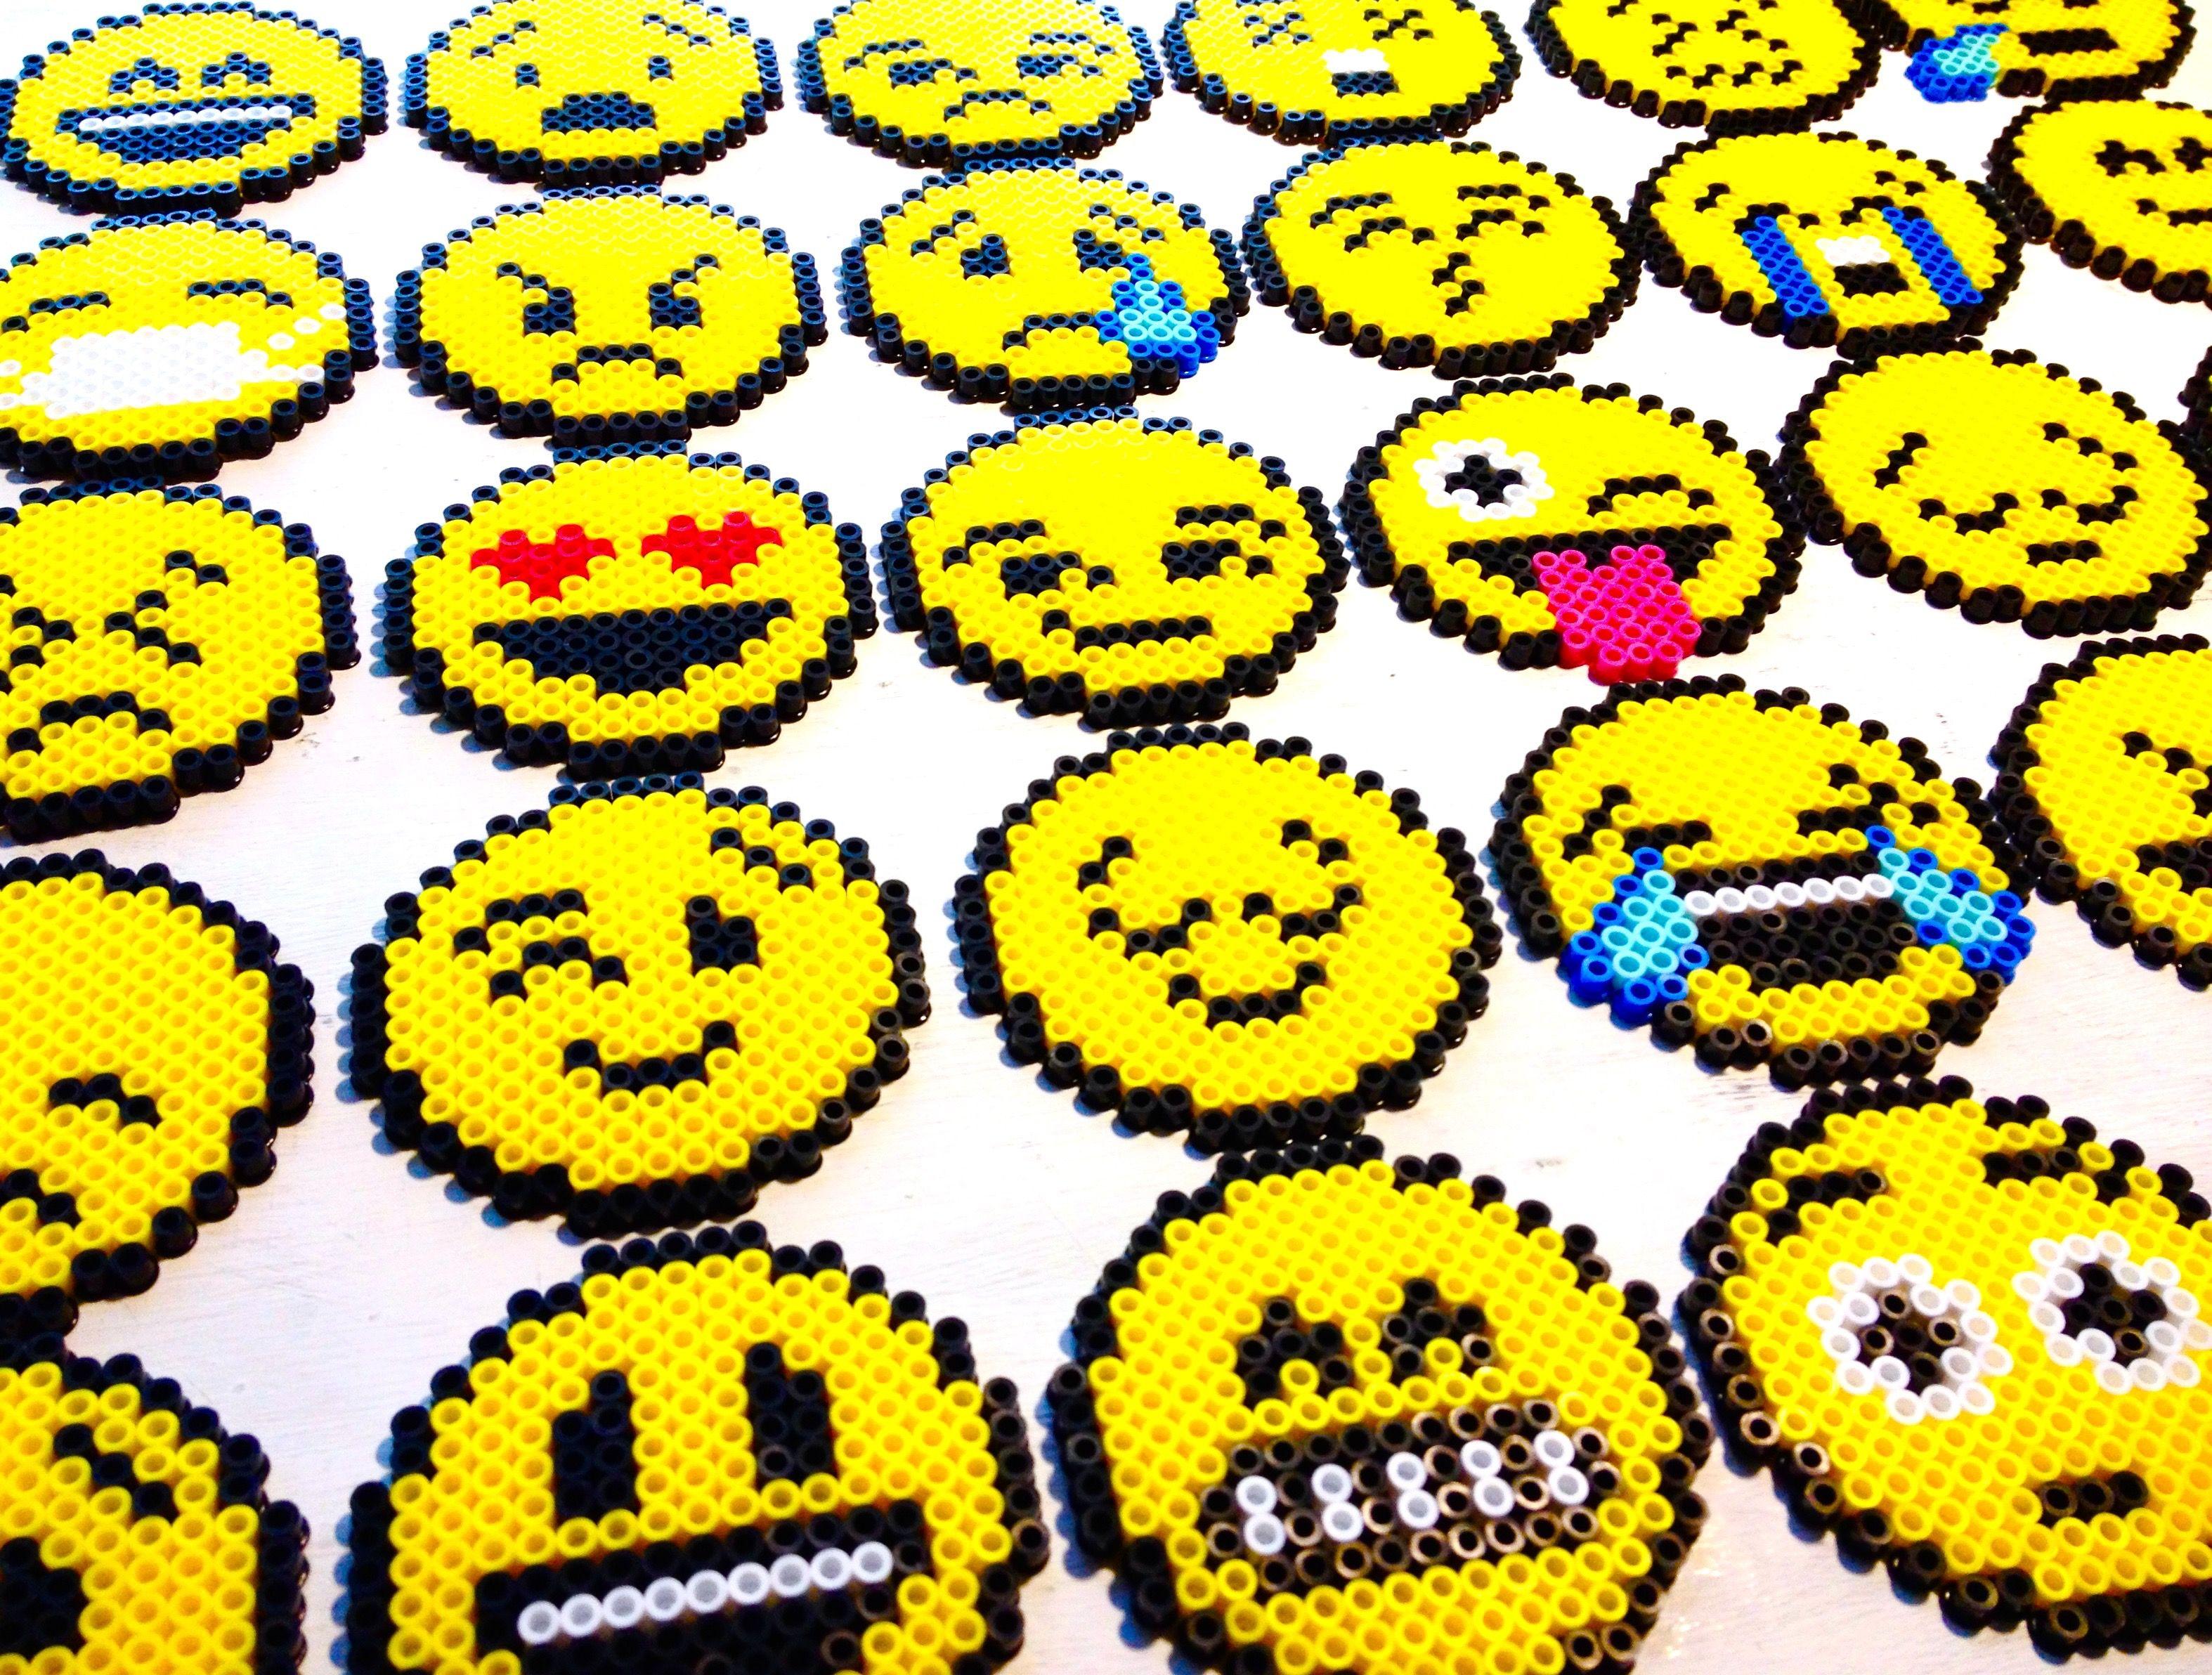 Emoji Perler Bead Patterns Awesome Design Inspiration